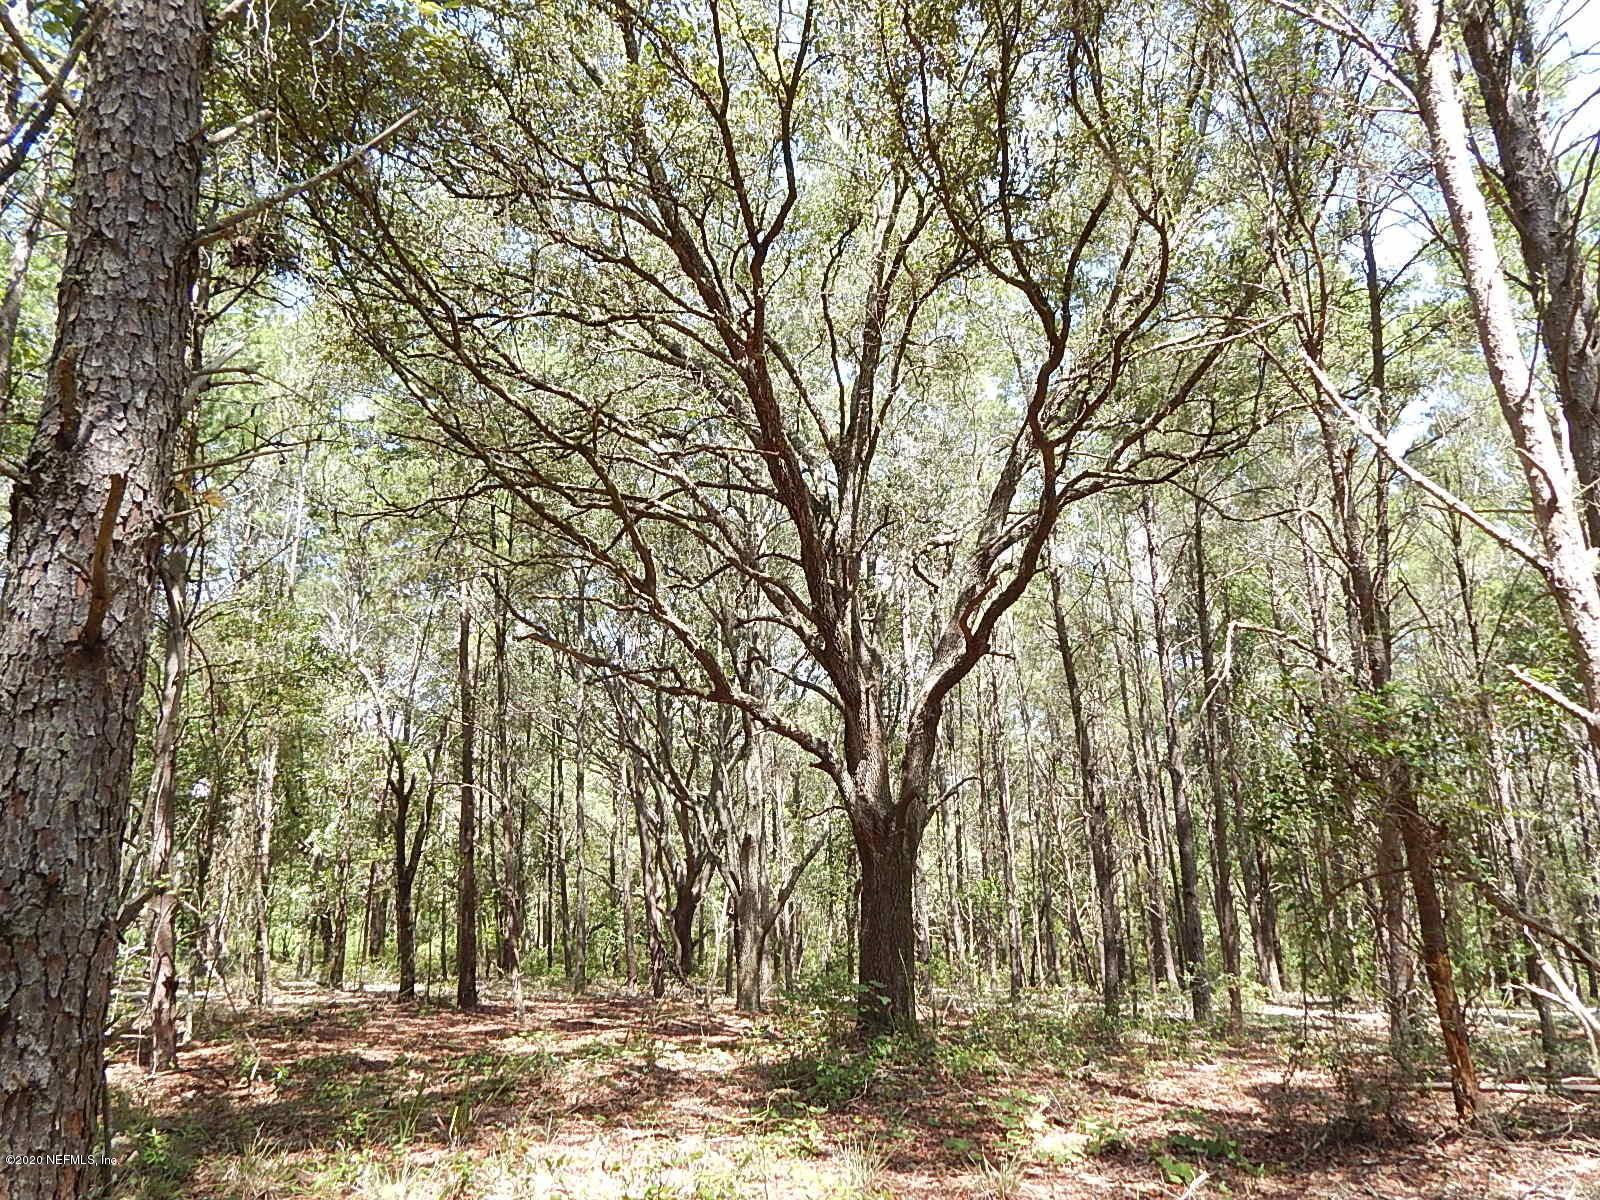 0 ORANGE TREE, POMONA PARK, FLORIDA 32181, ,Vacant land,For sale,ORANGE TREE,1060320